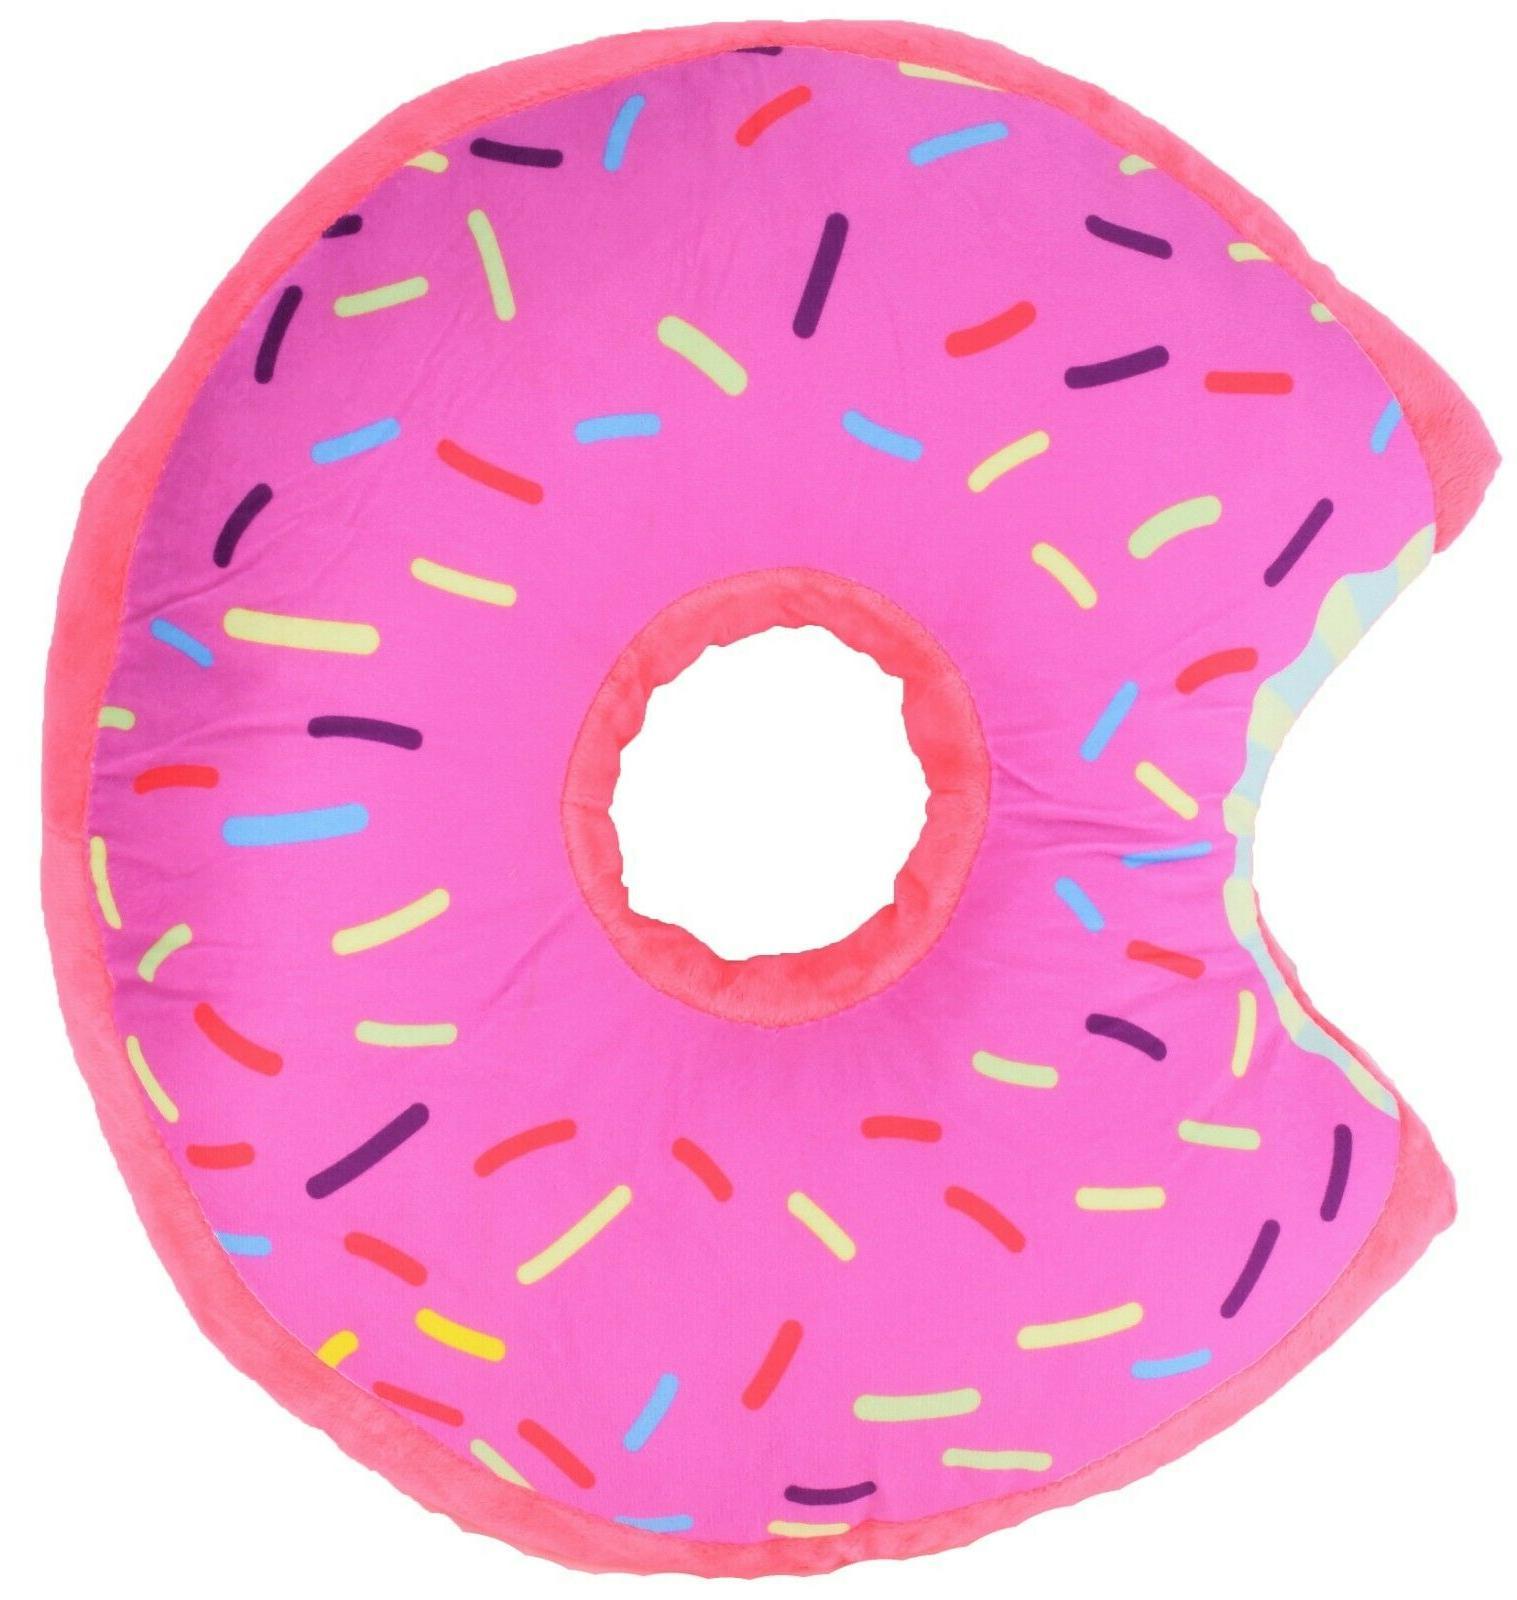 Donut Shaped Plush Sprinkled Toy